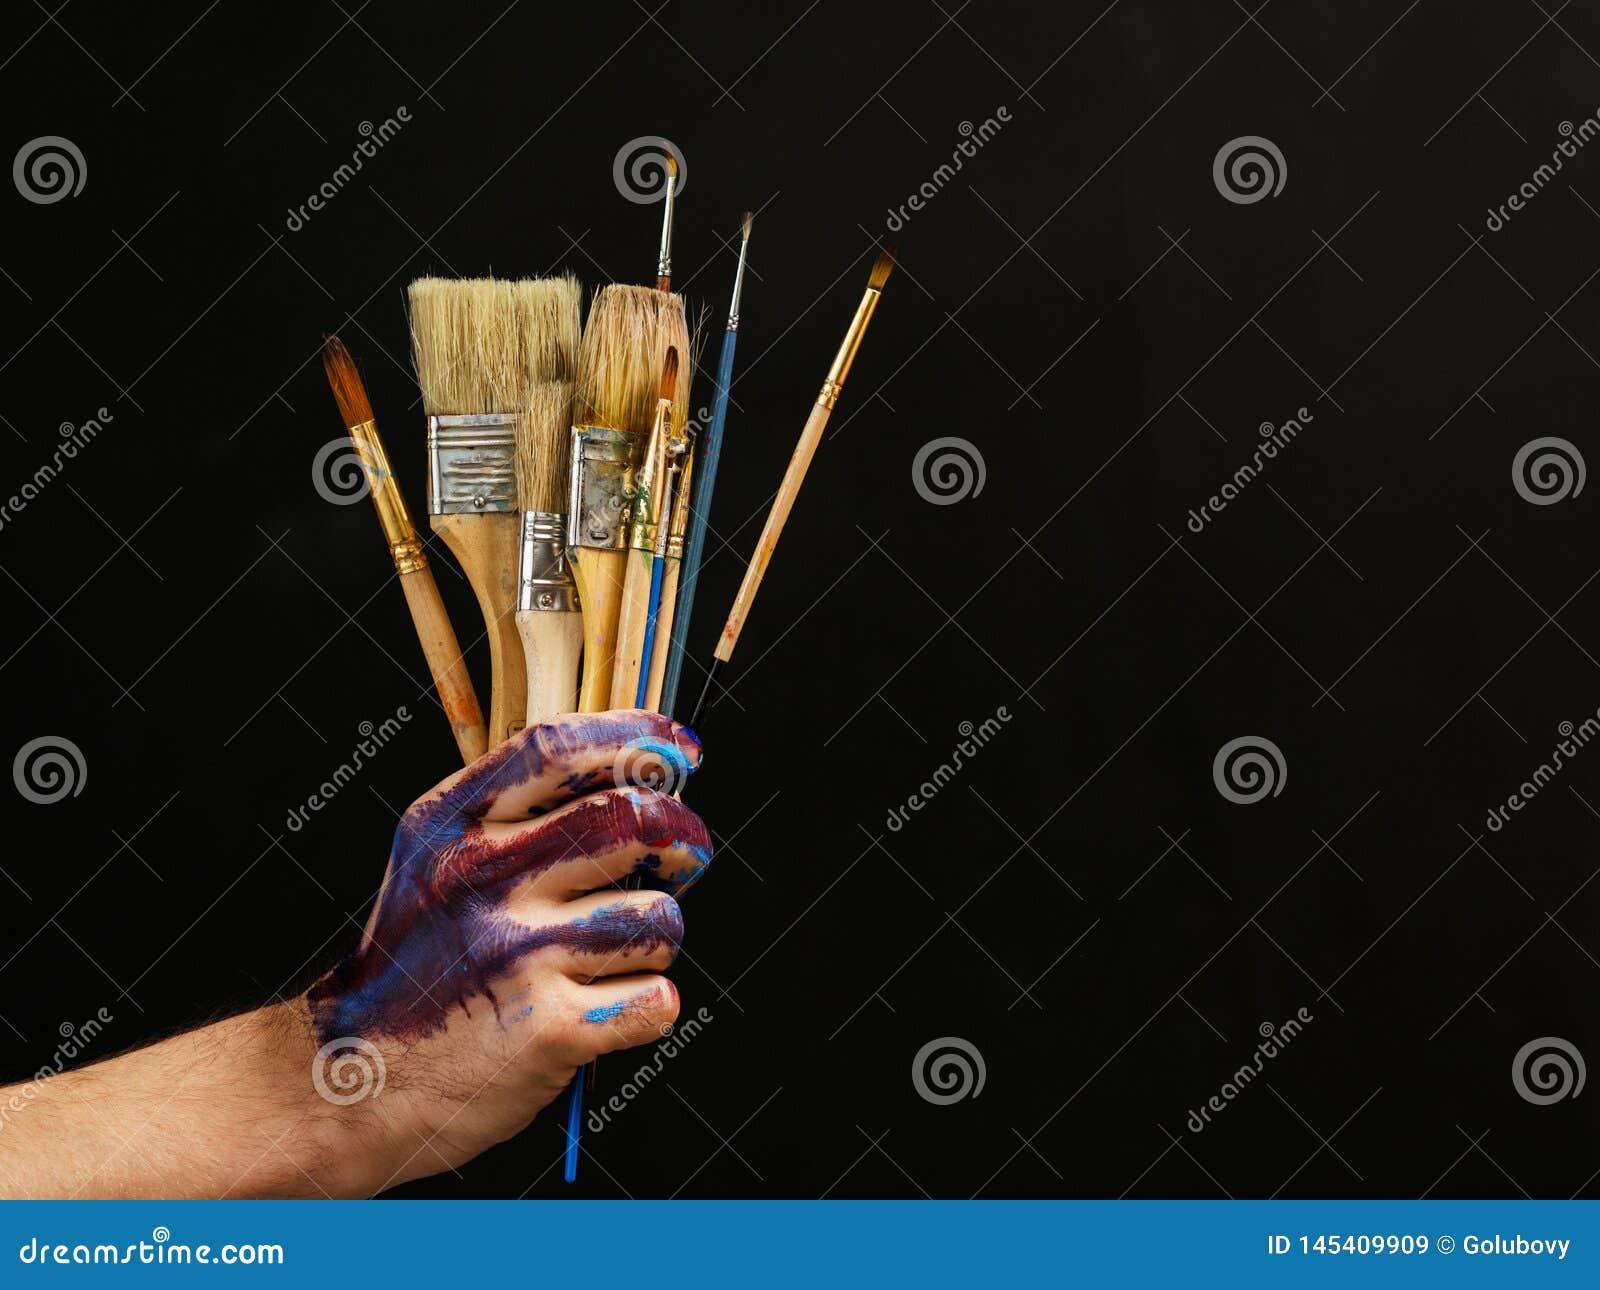 Modern art painter essential tools paintbrushes